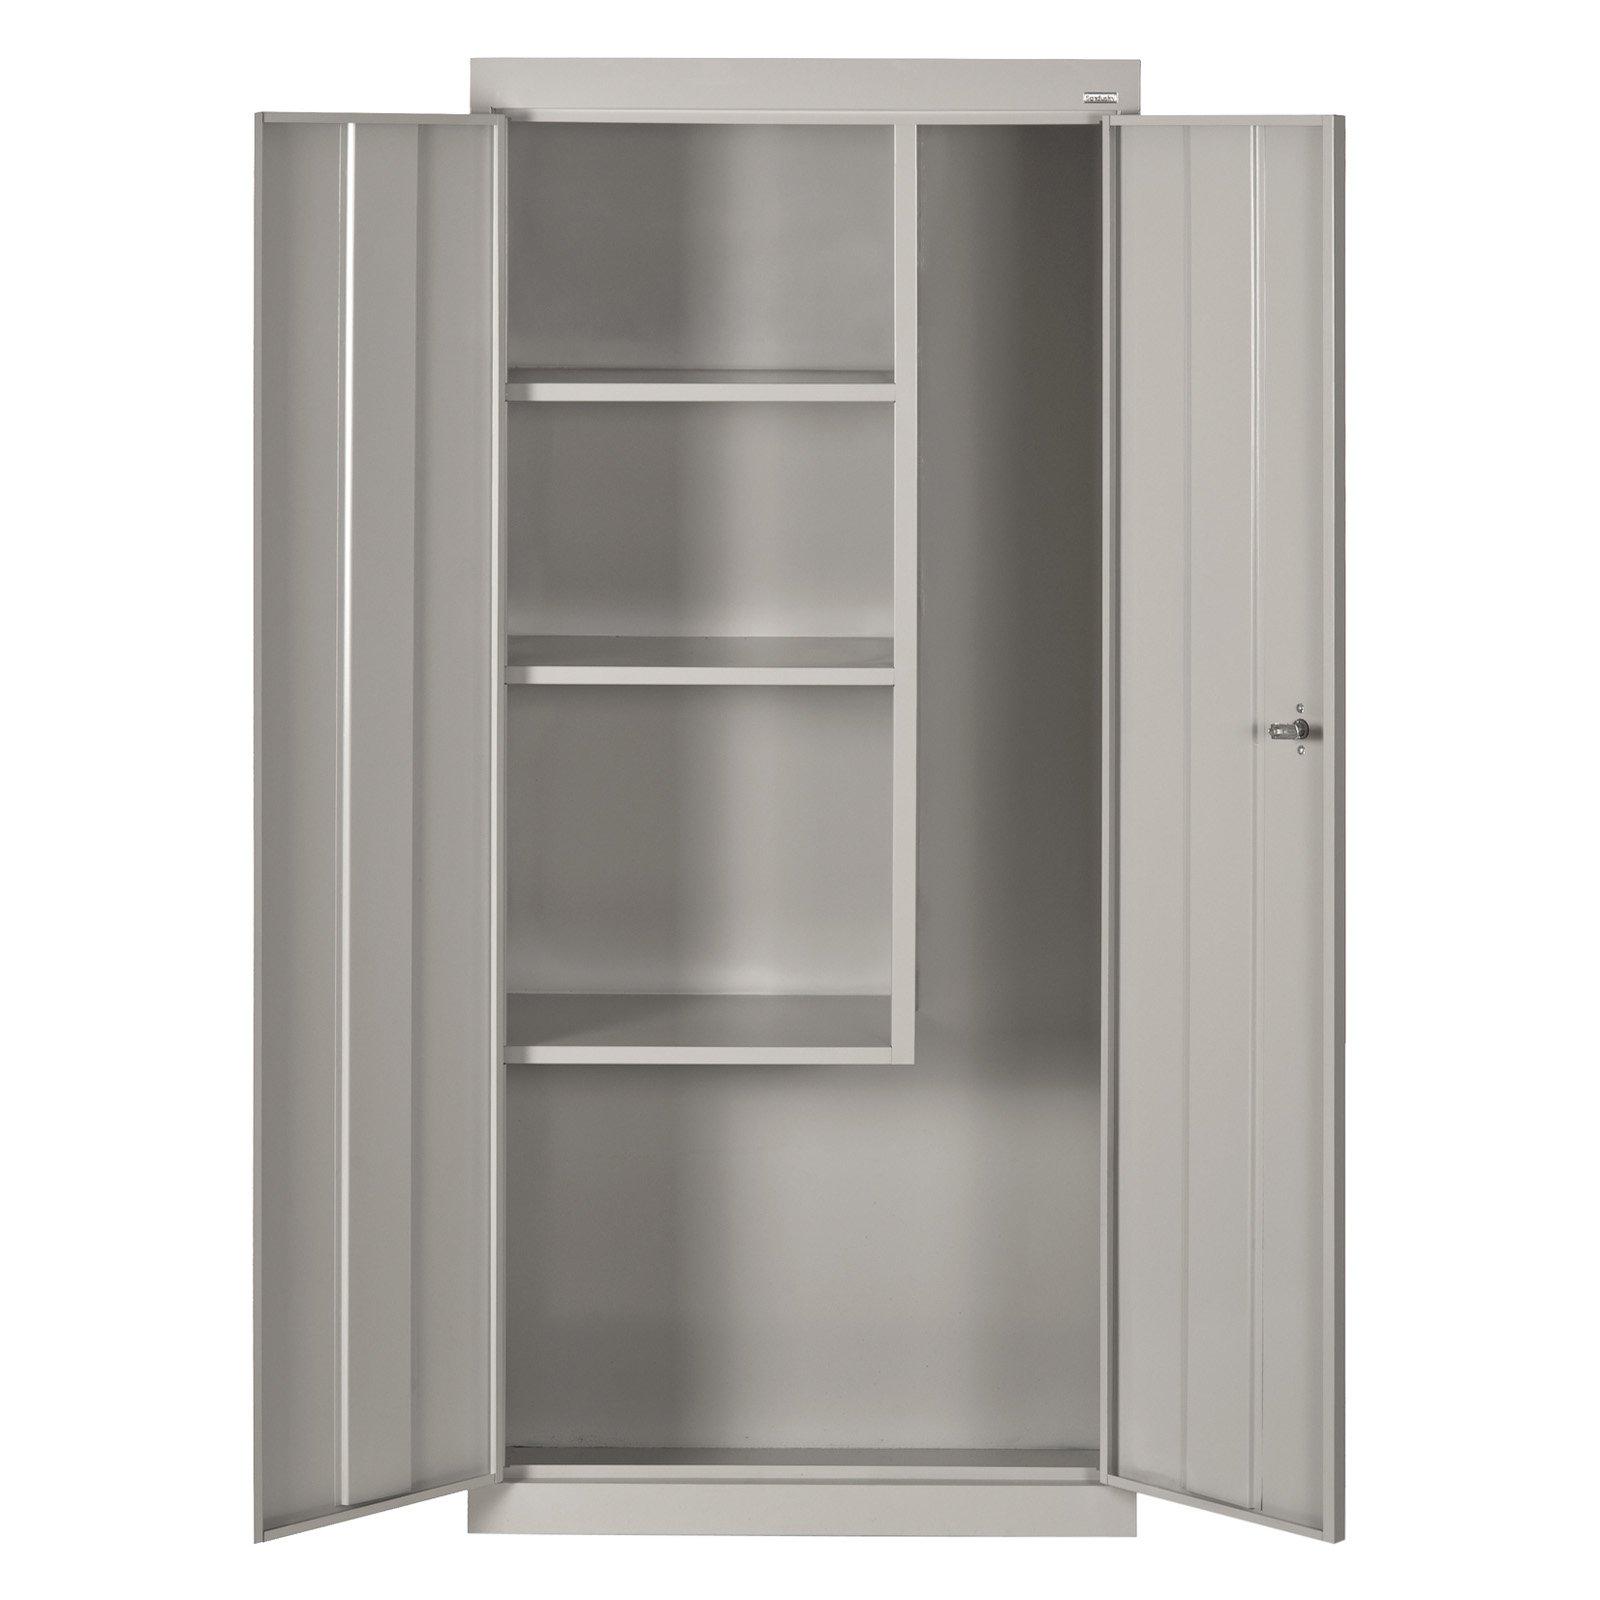 Edsal Classic Supply Cabinet